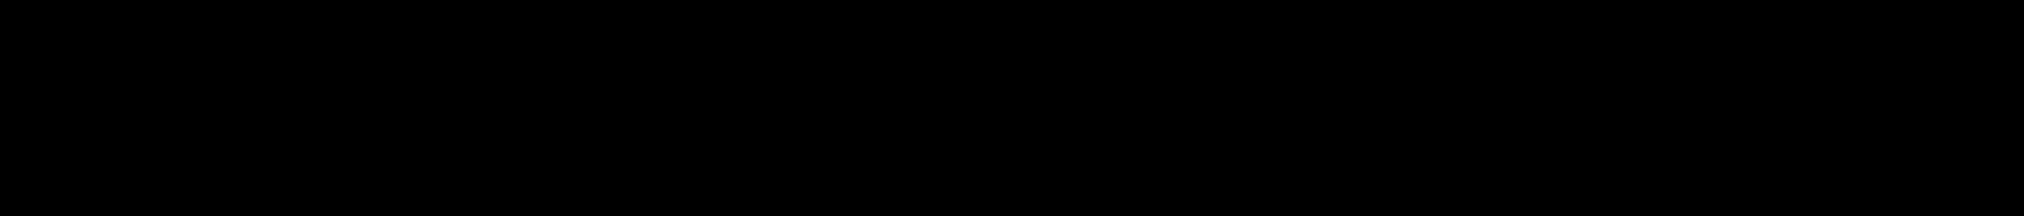 rf111